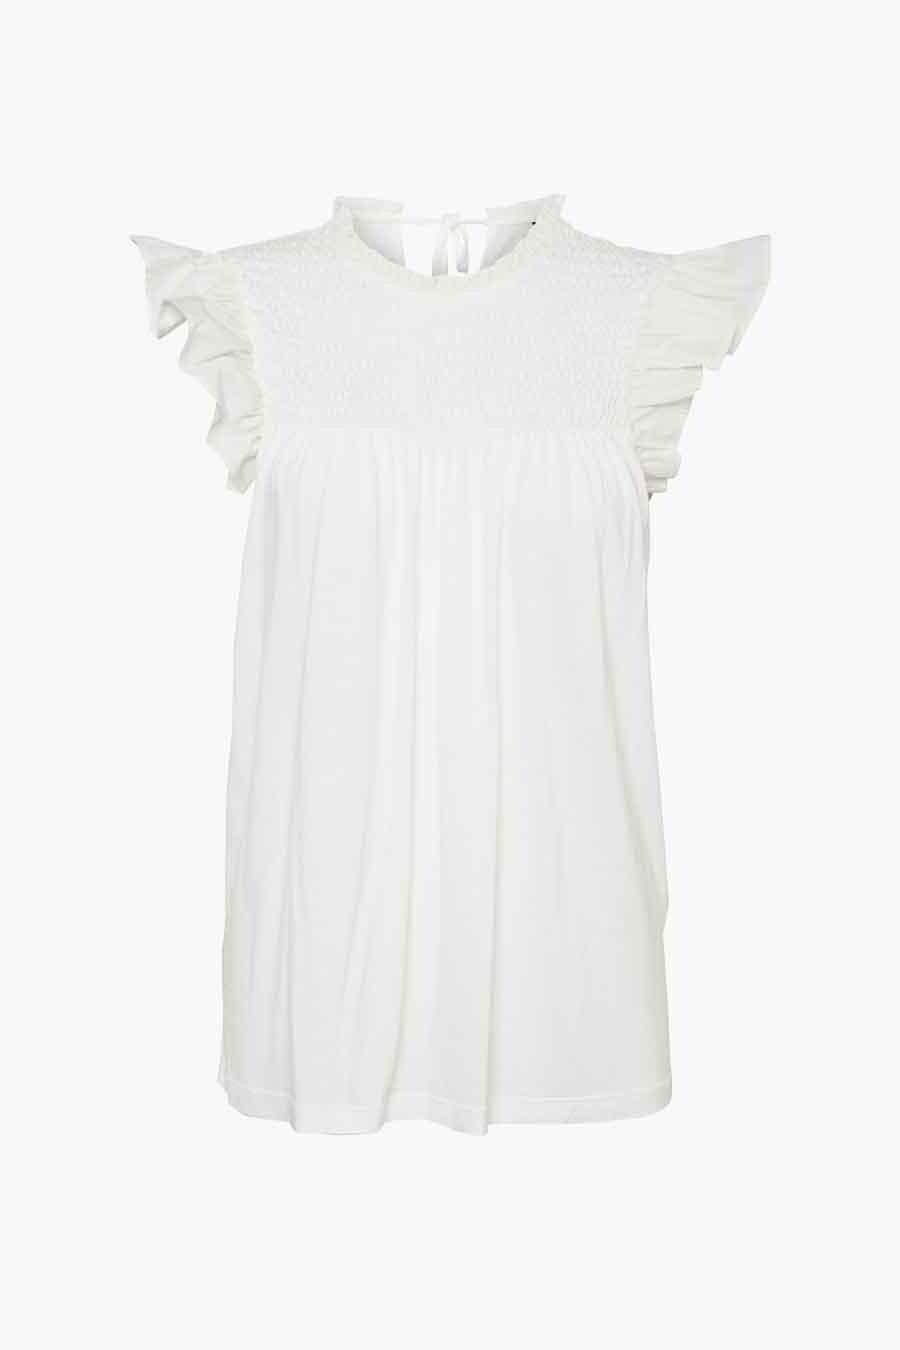 Vero Moda® Blouse korte mouwen, Wit, Dames, Maat: L/M/S